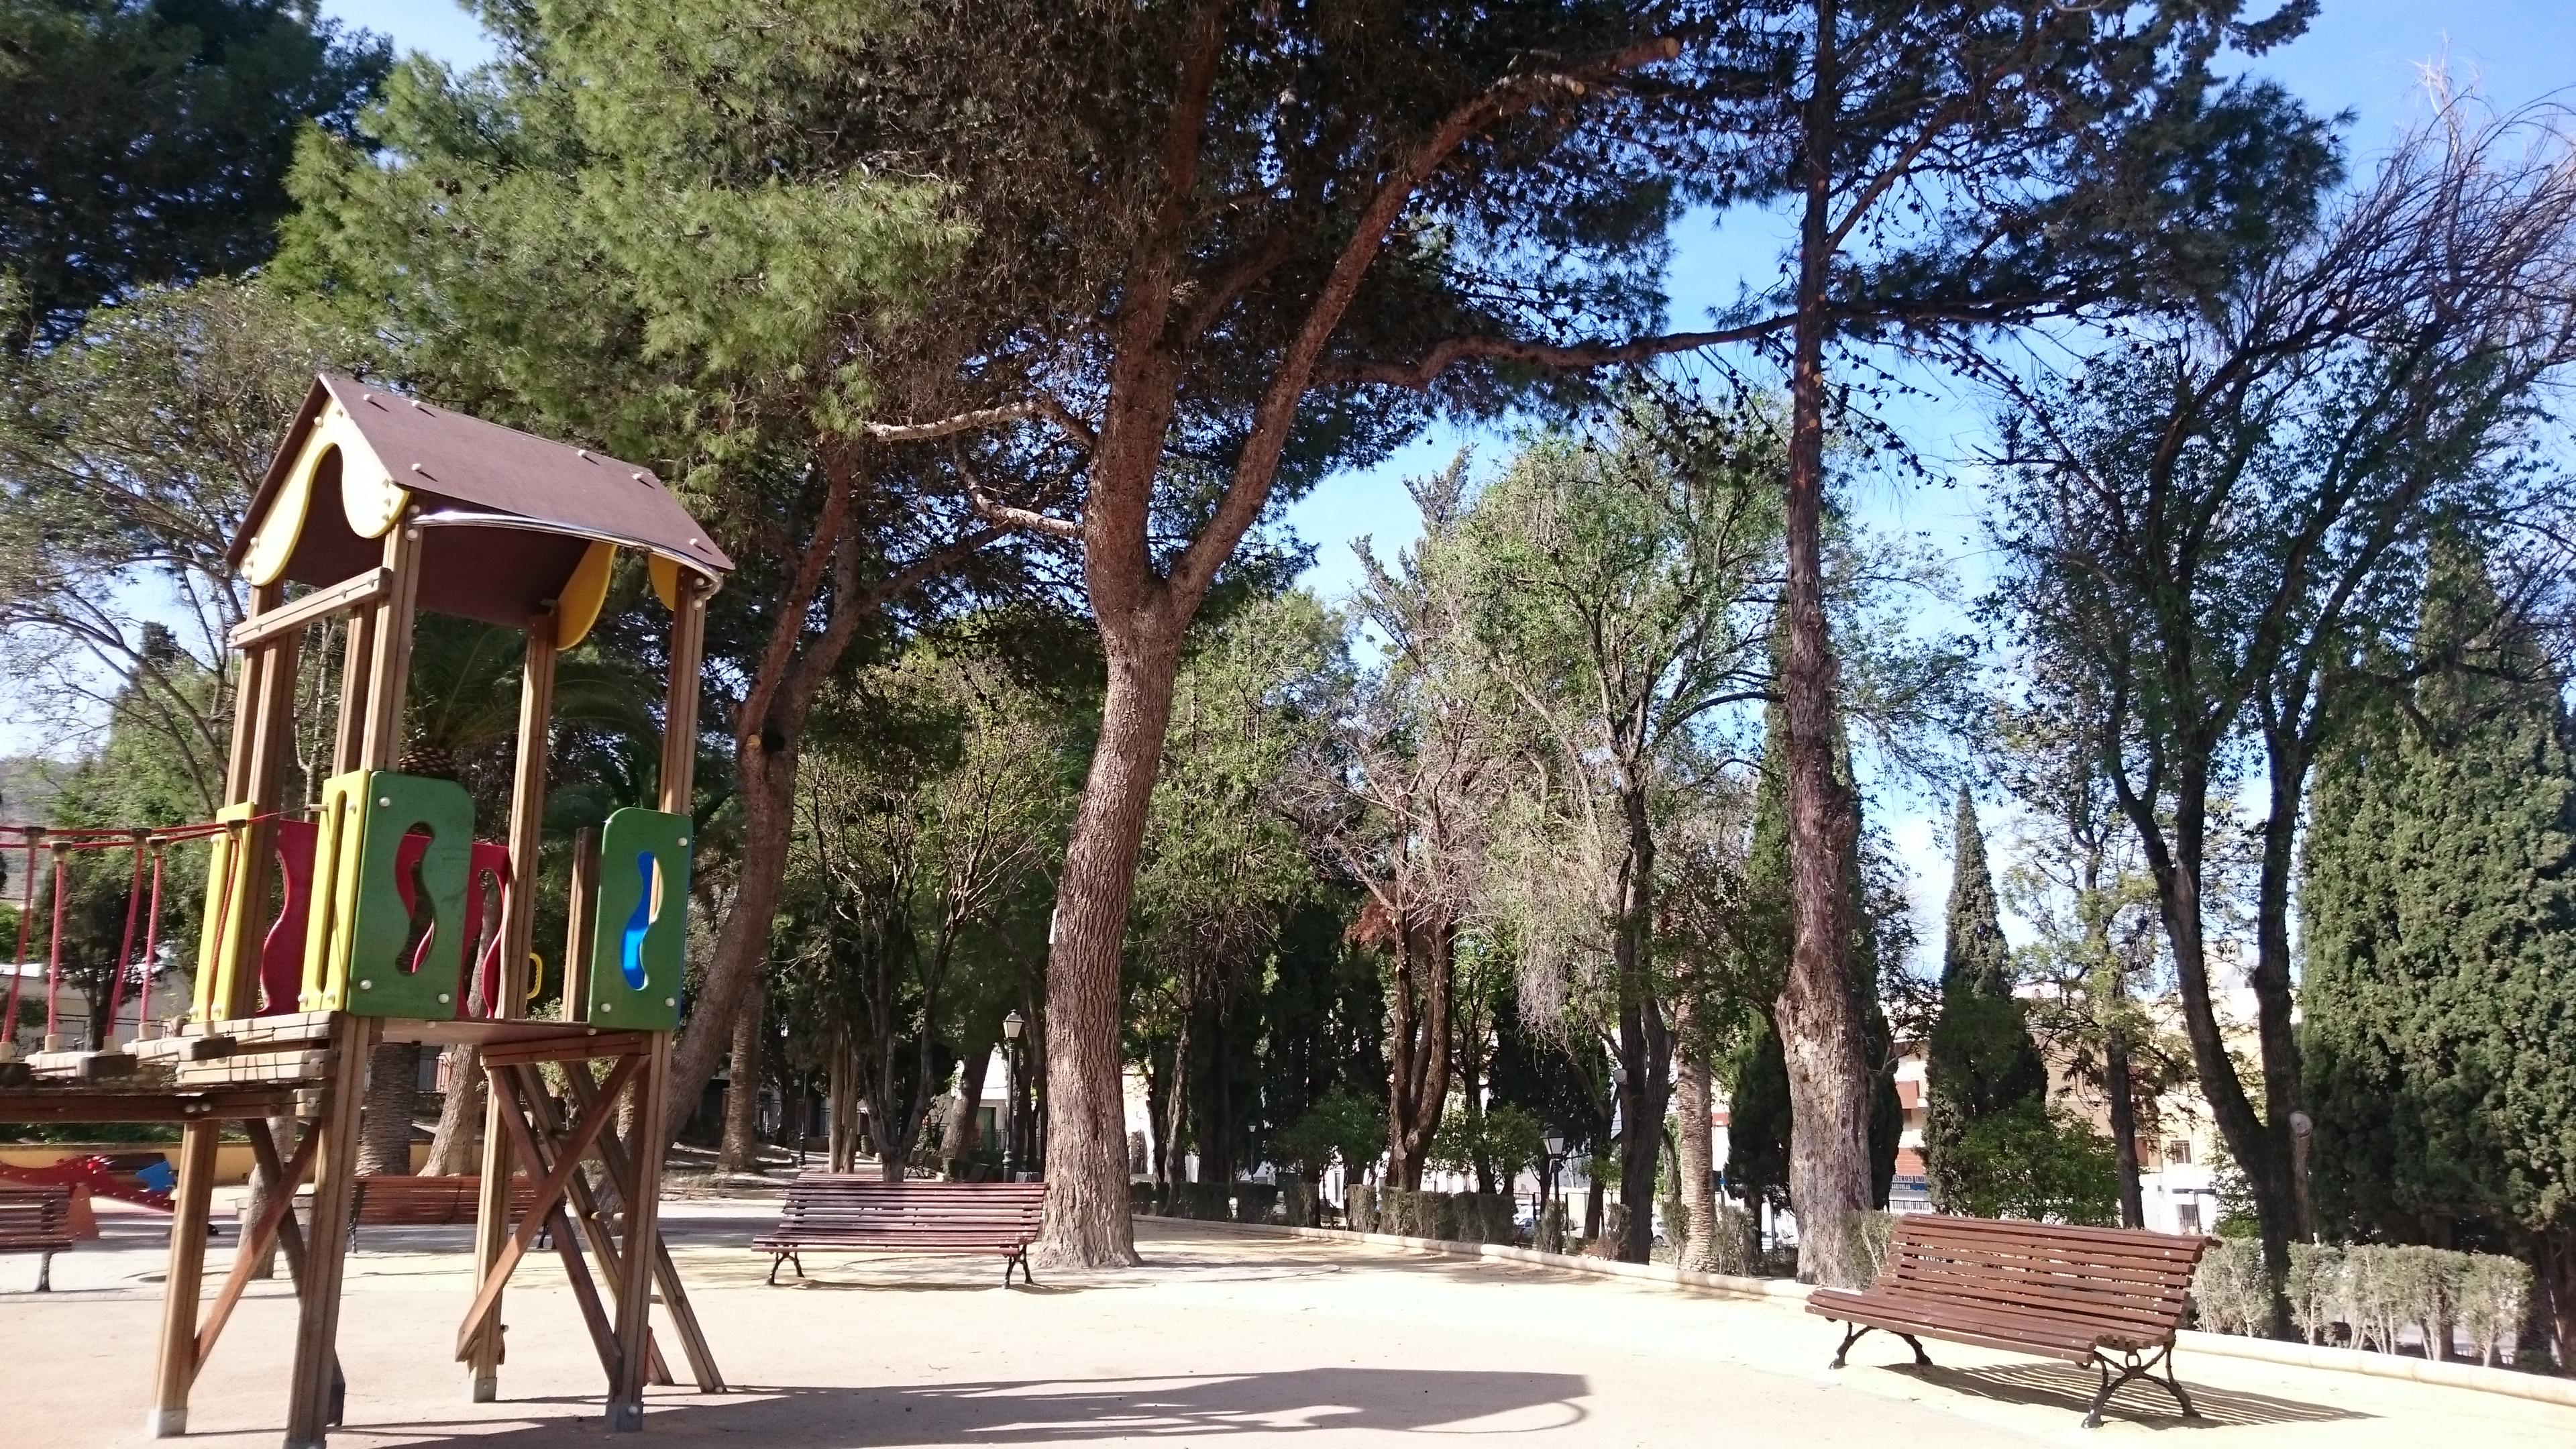 Parque Municipal Príncipe de Asturias en Estepa